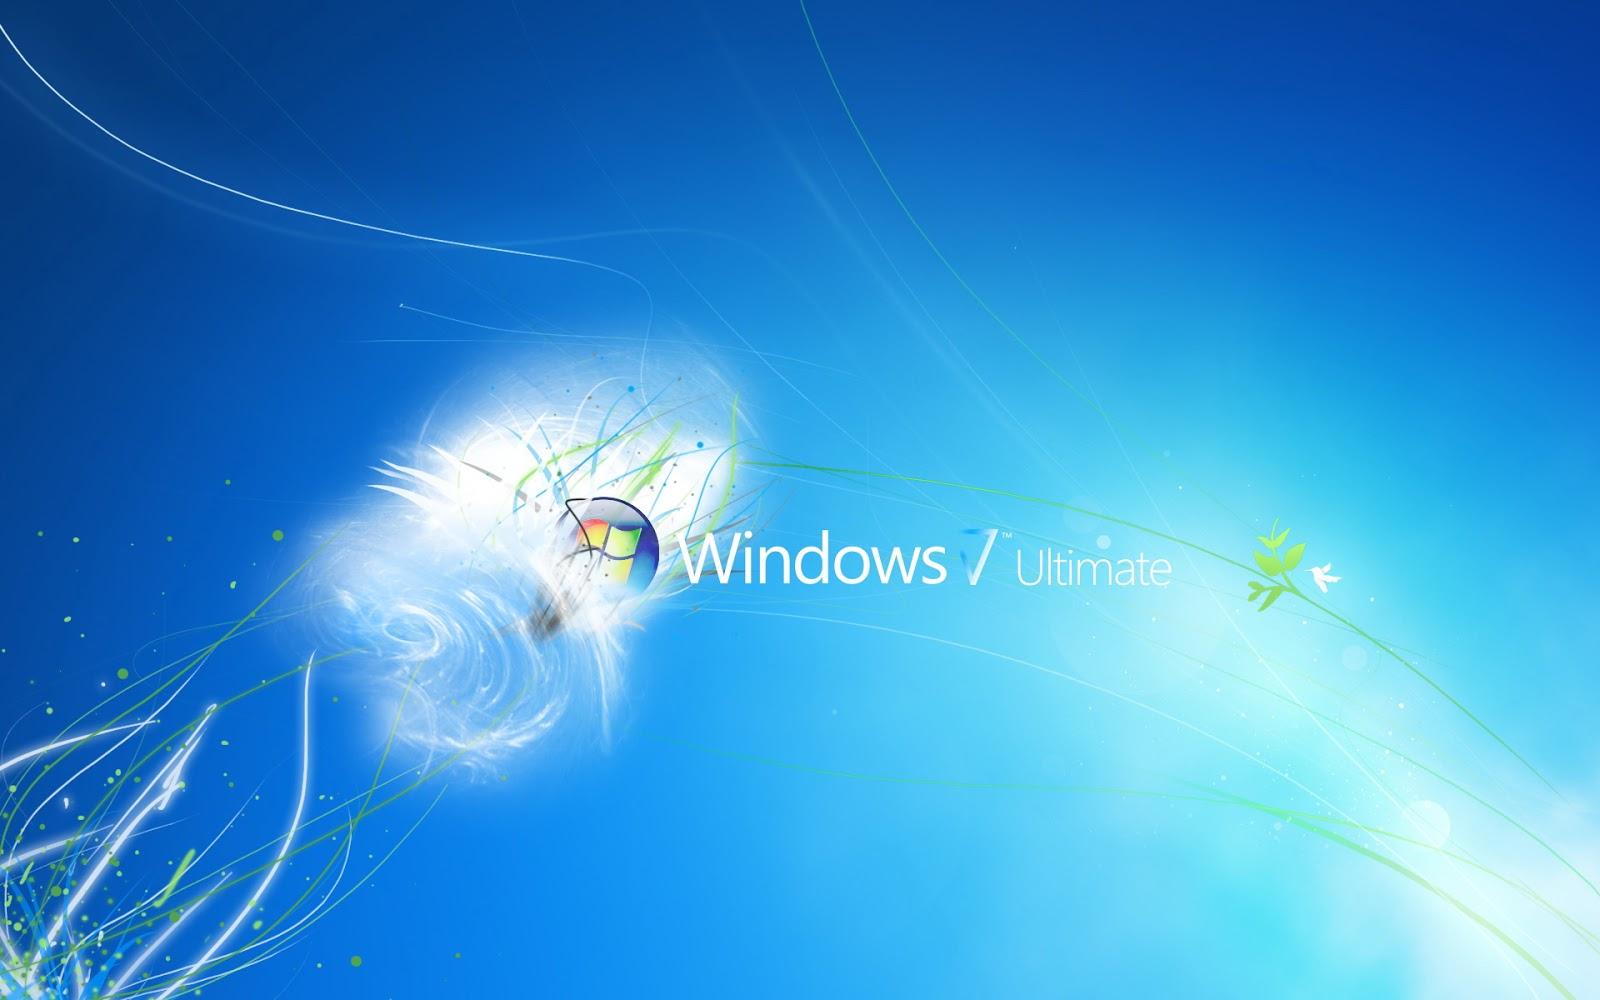 windows 7 download 32 bit crack